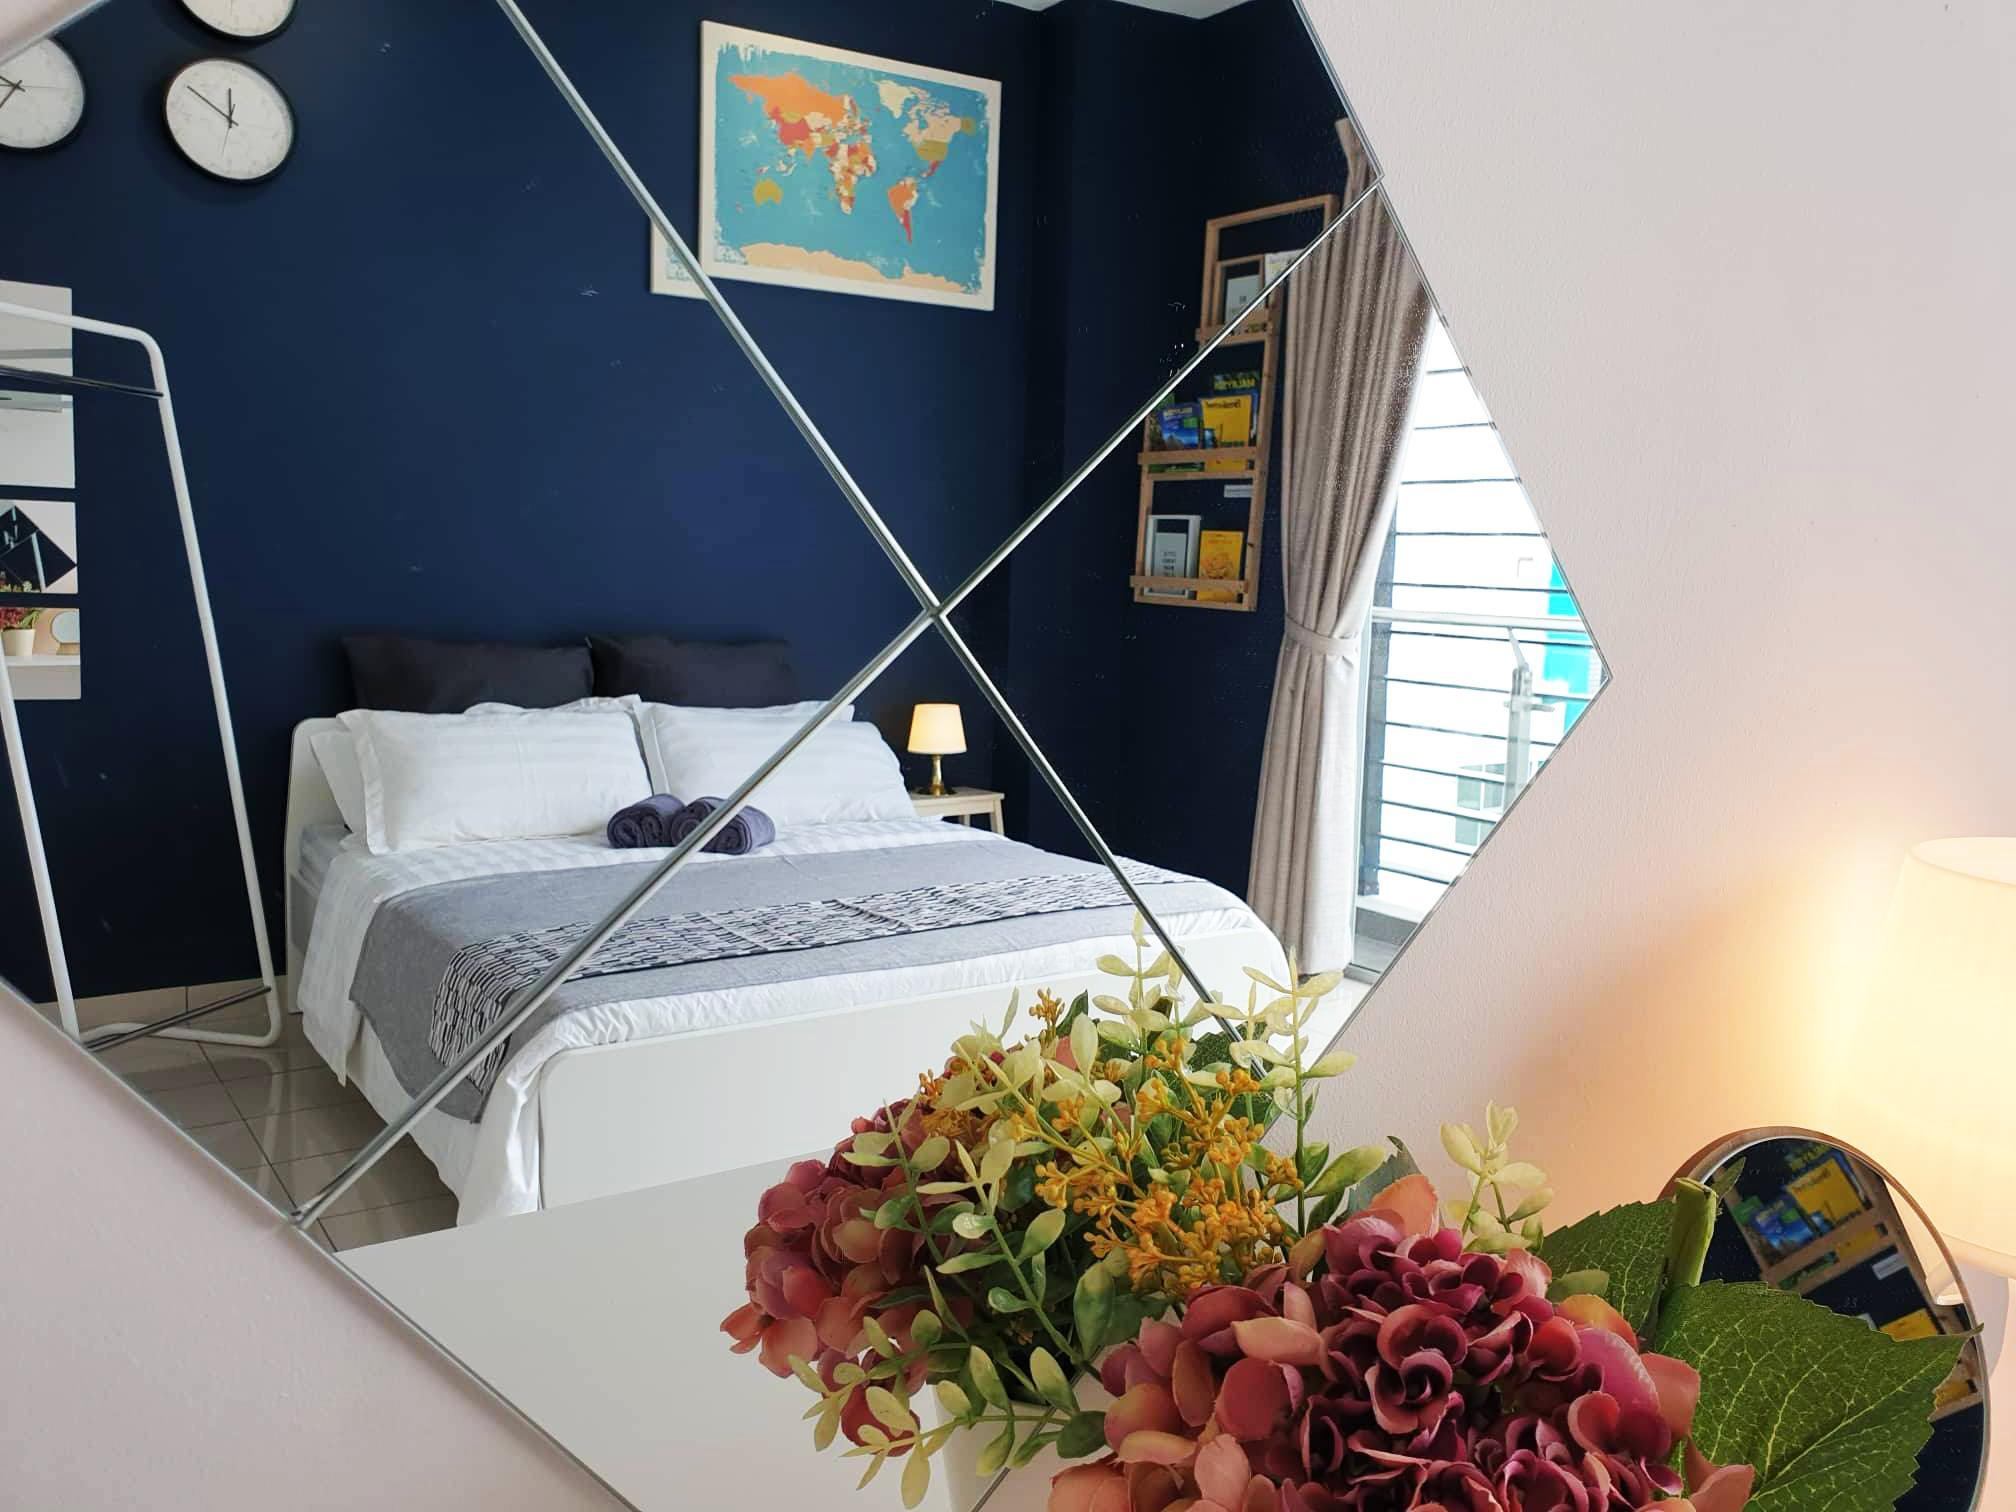 [Kairos Plus] Aero17 Elegance Home [2 Pax]